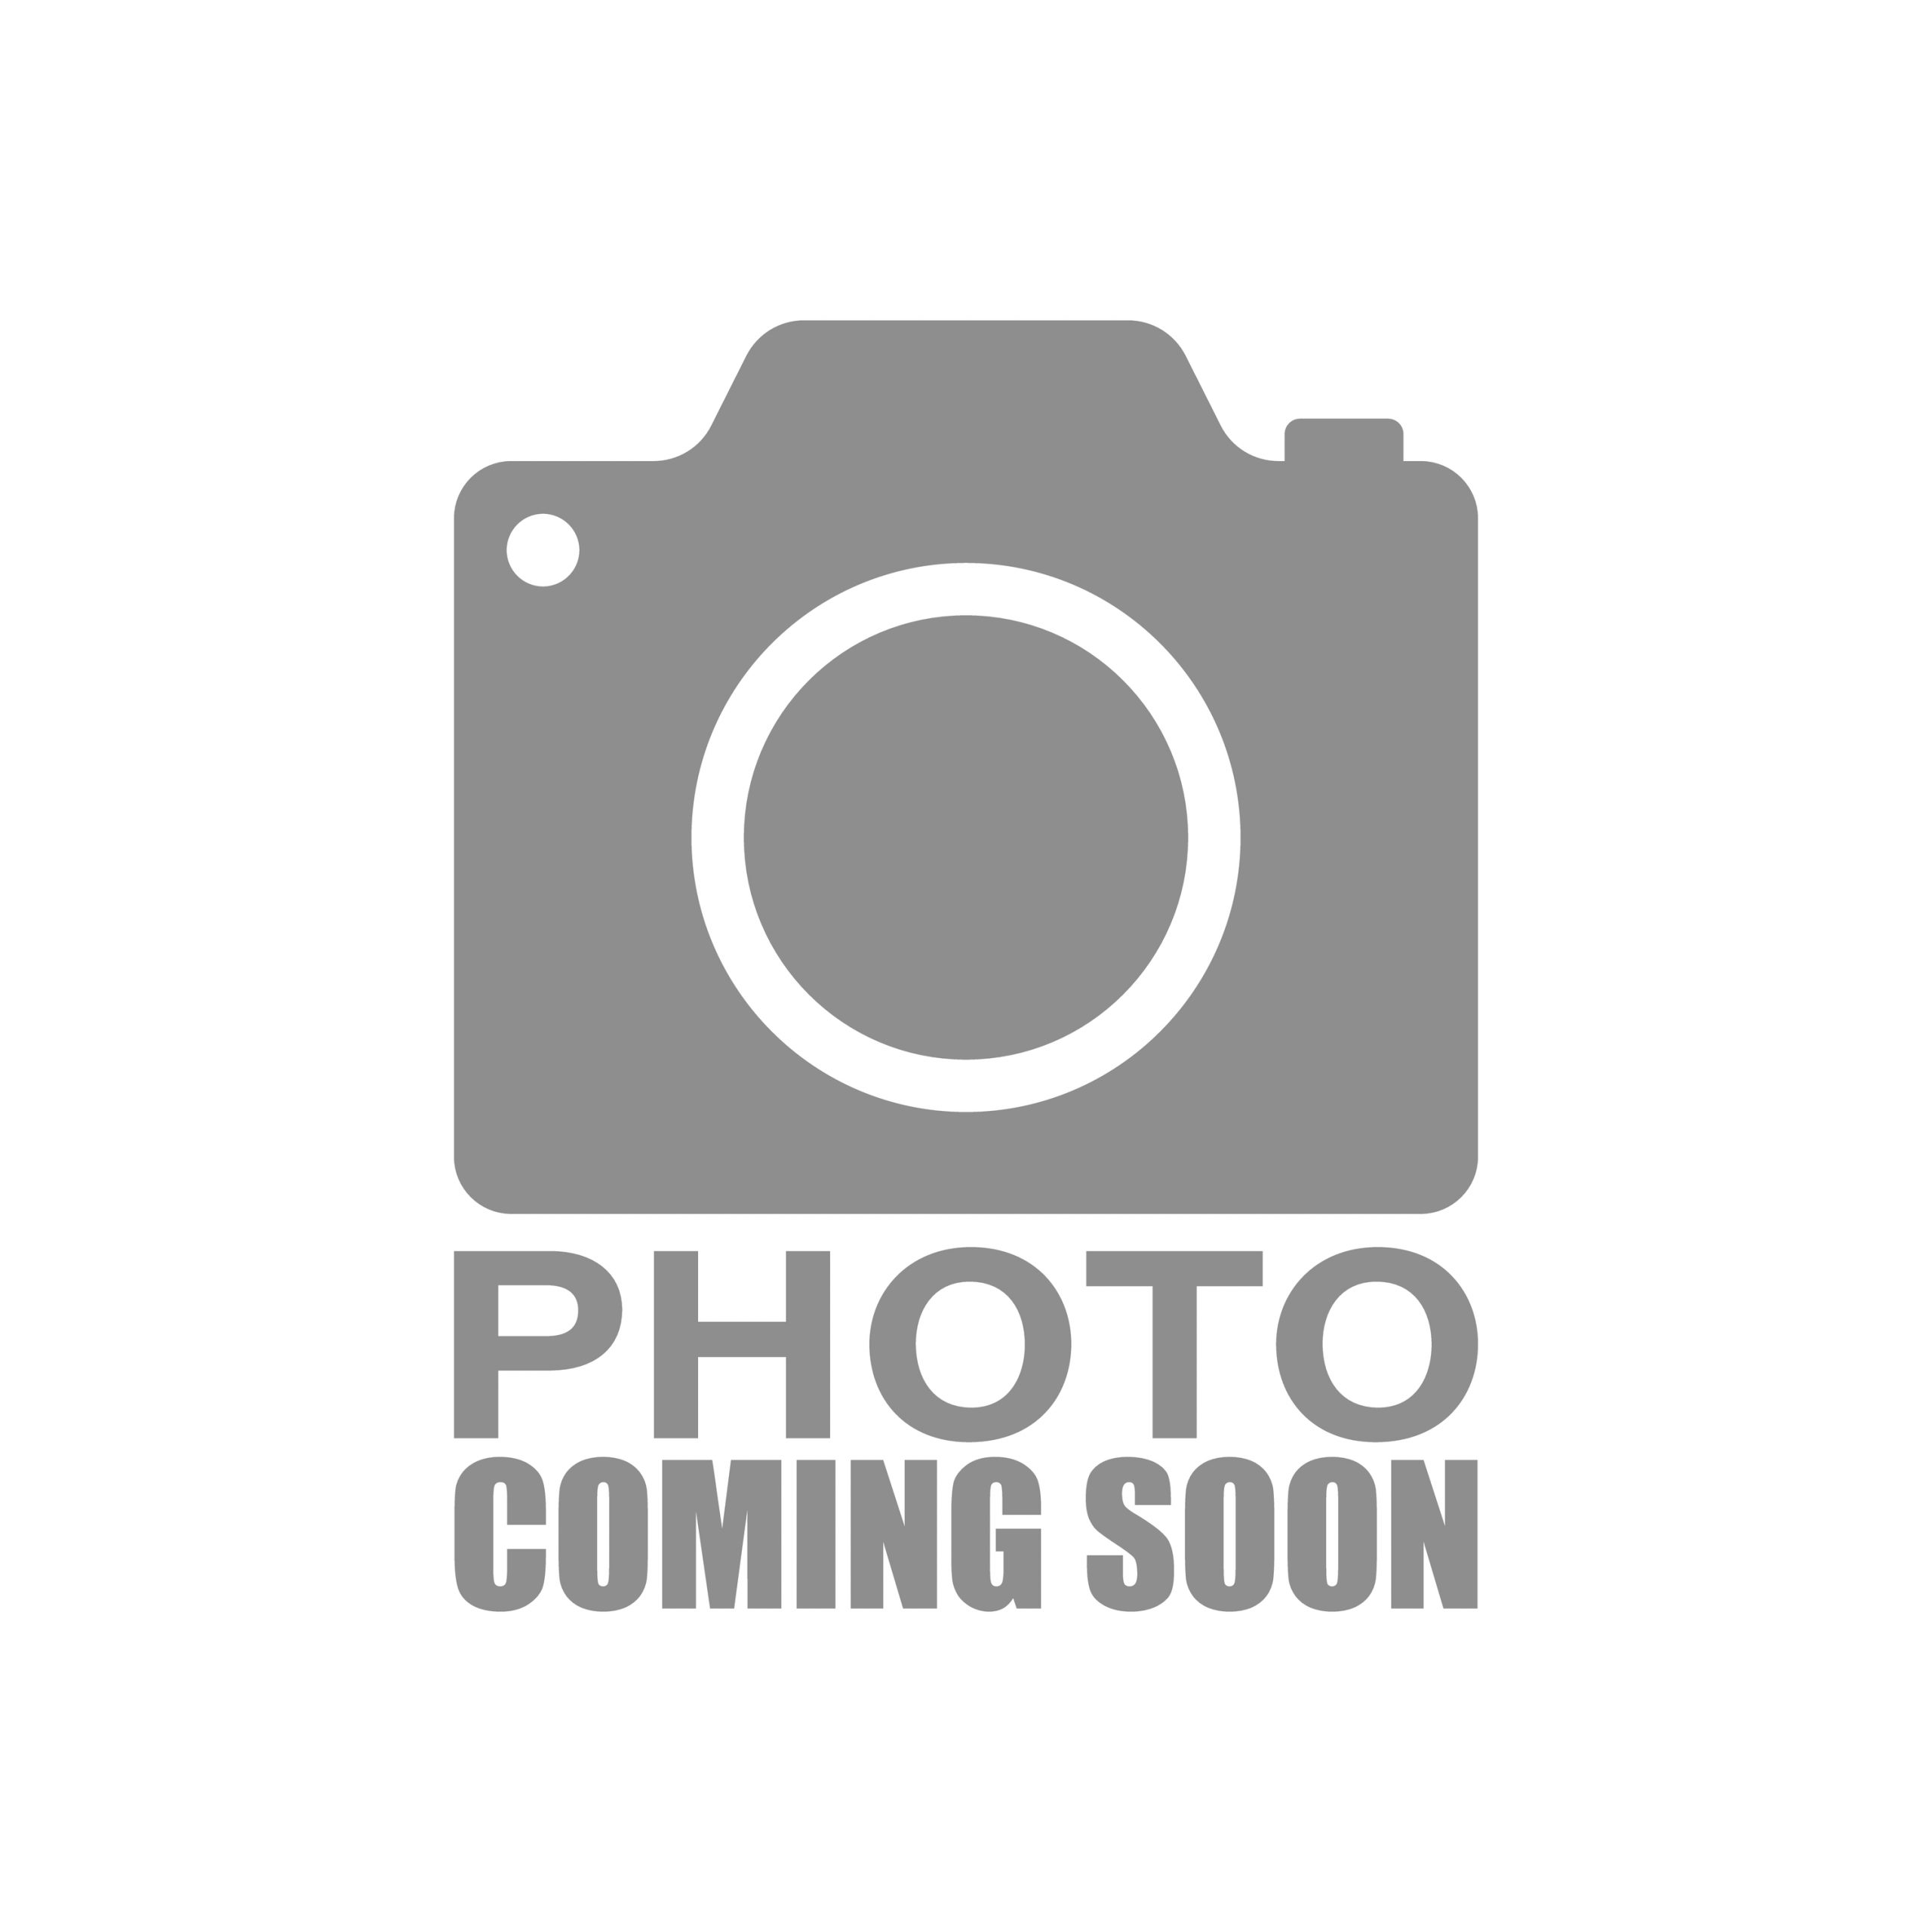 Filippi Panettone Glassato (Icing & Grilled Almonds) 500G